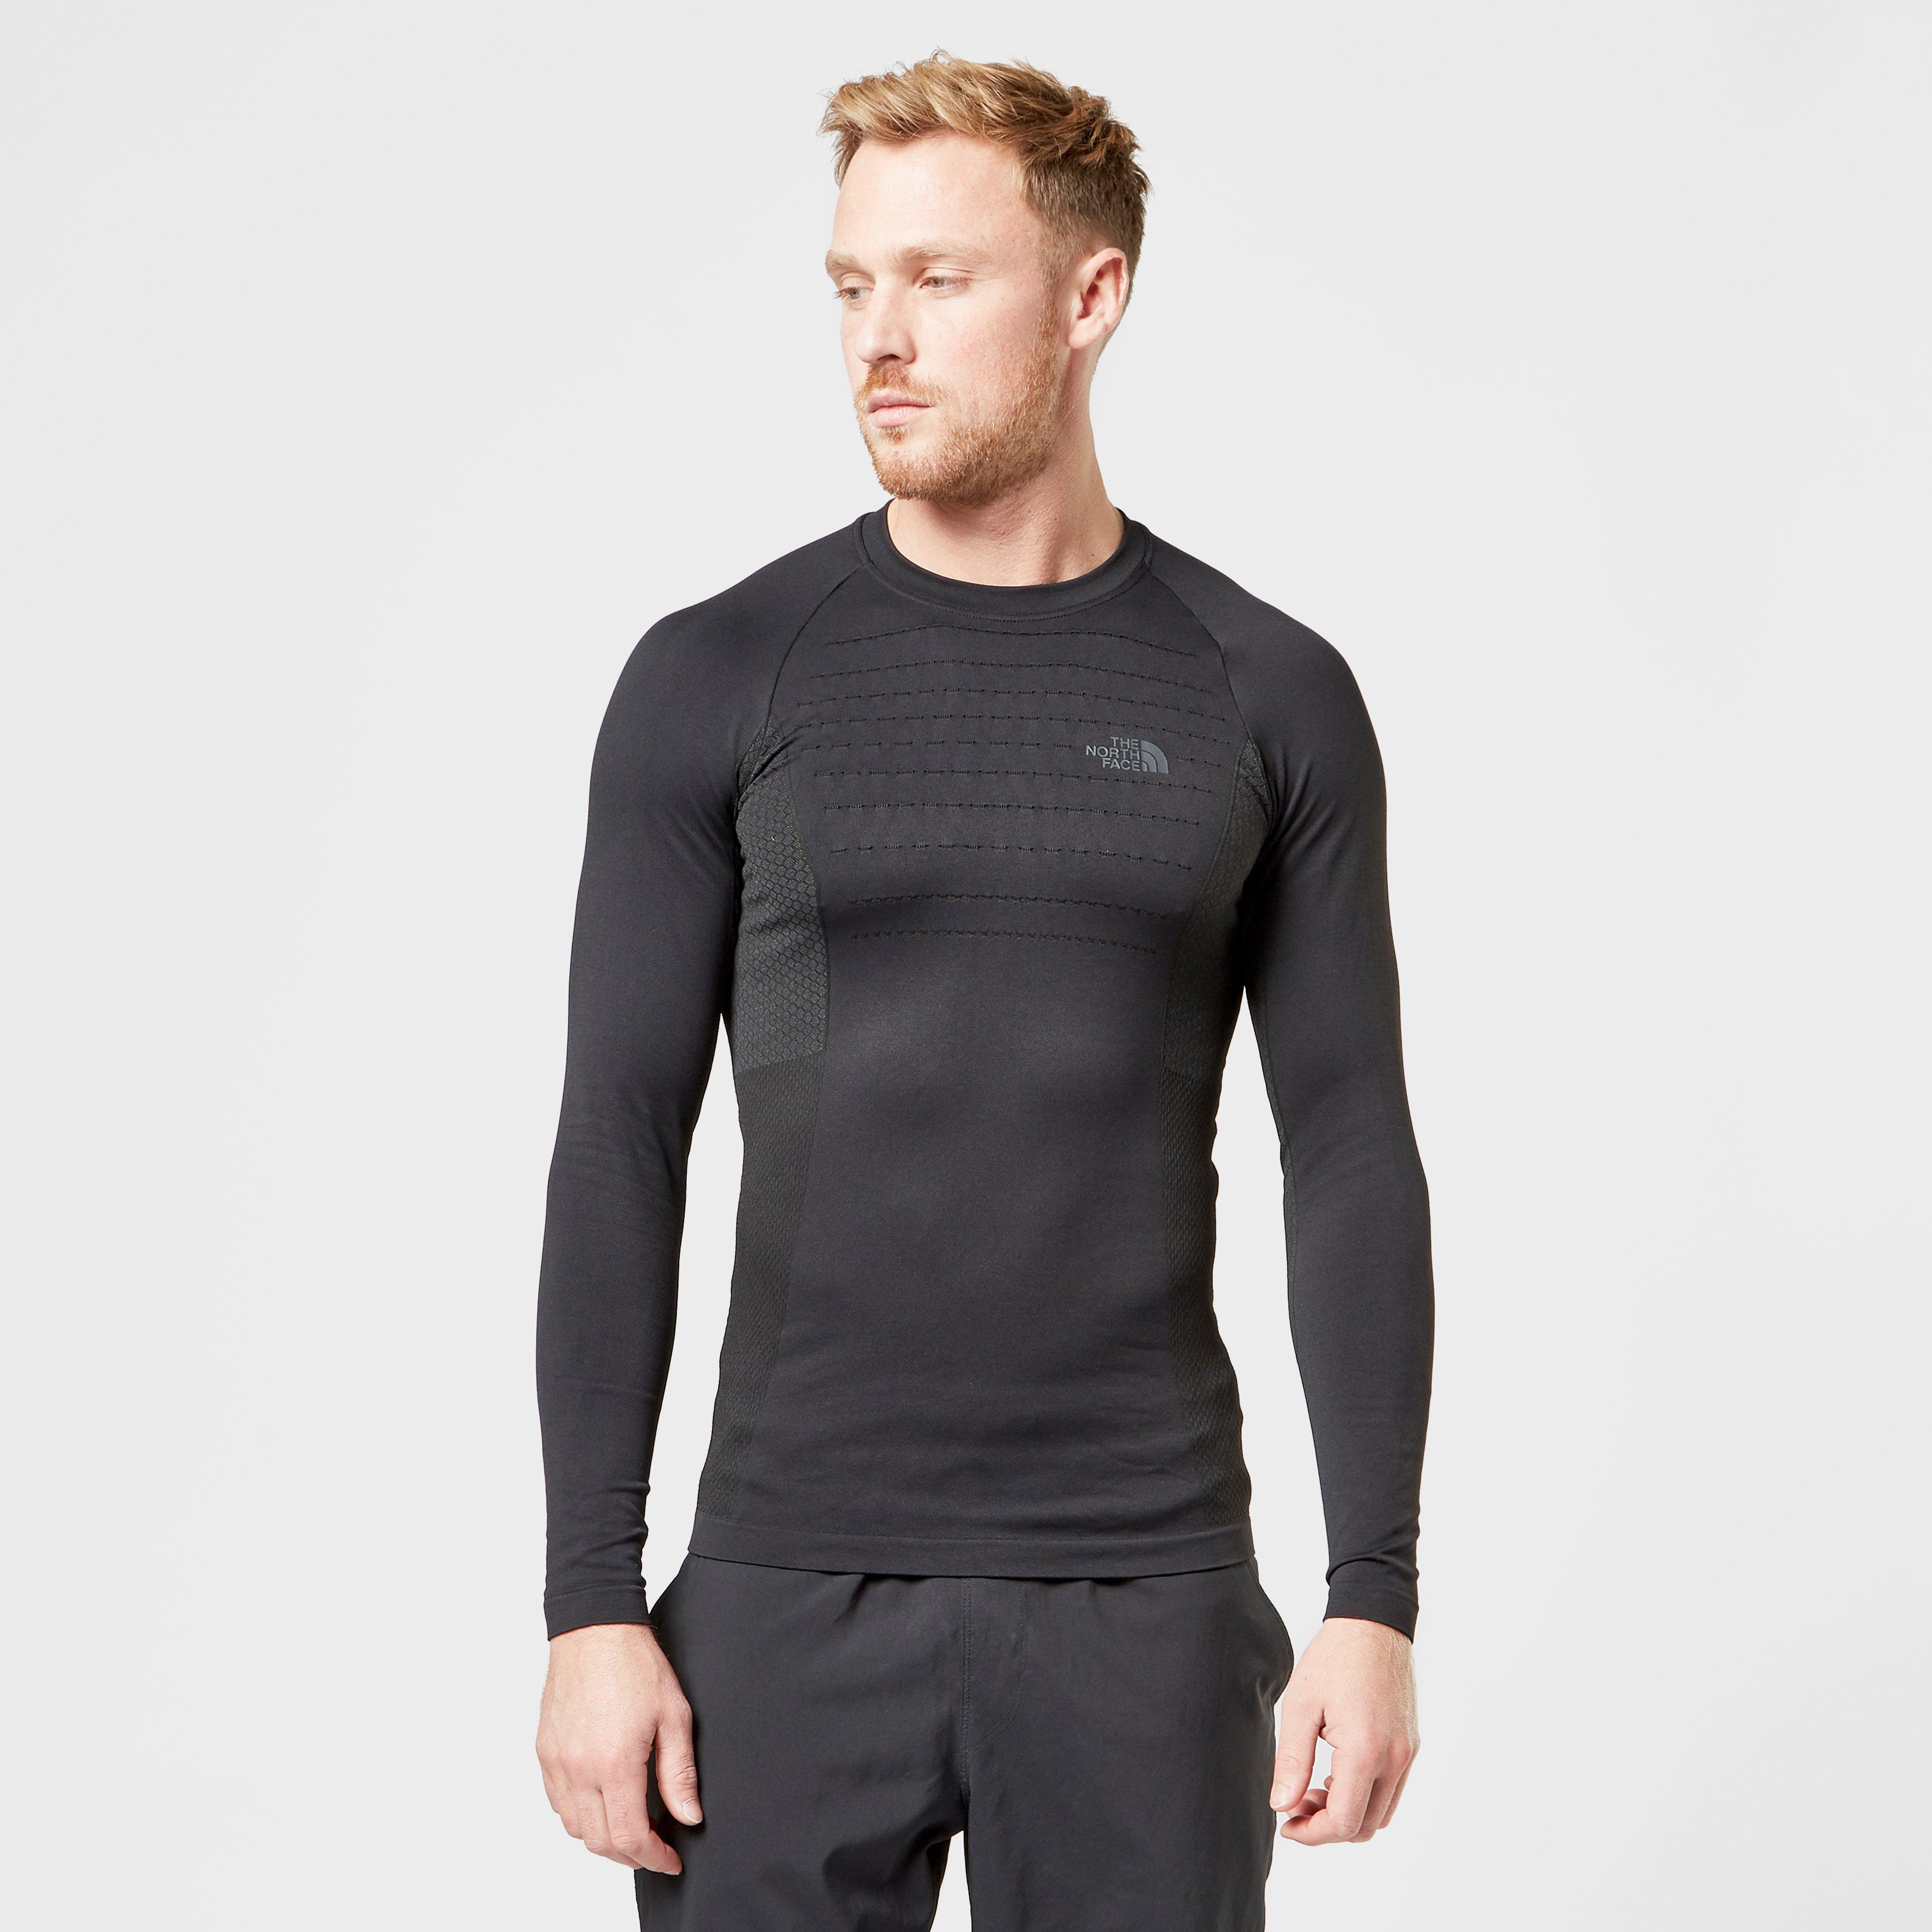 The North Face Men's Sport Long Sleeve Crew Neck - Black, Black